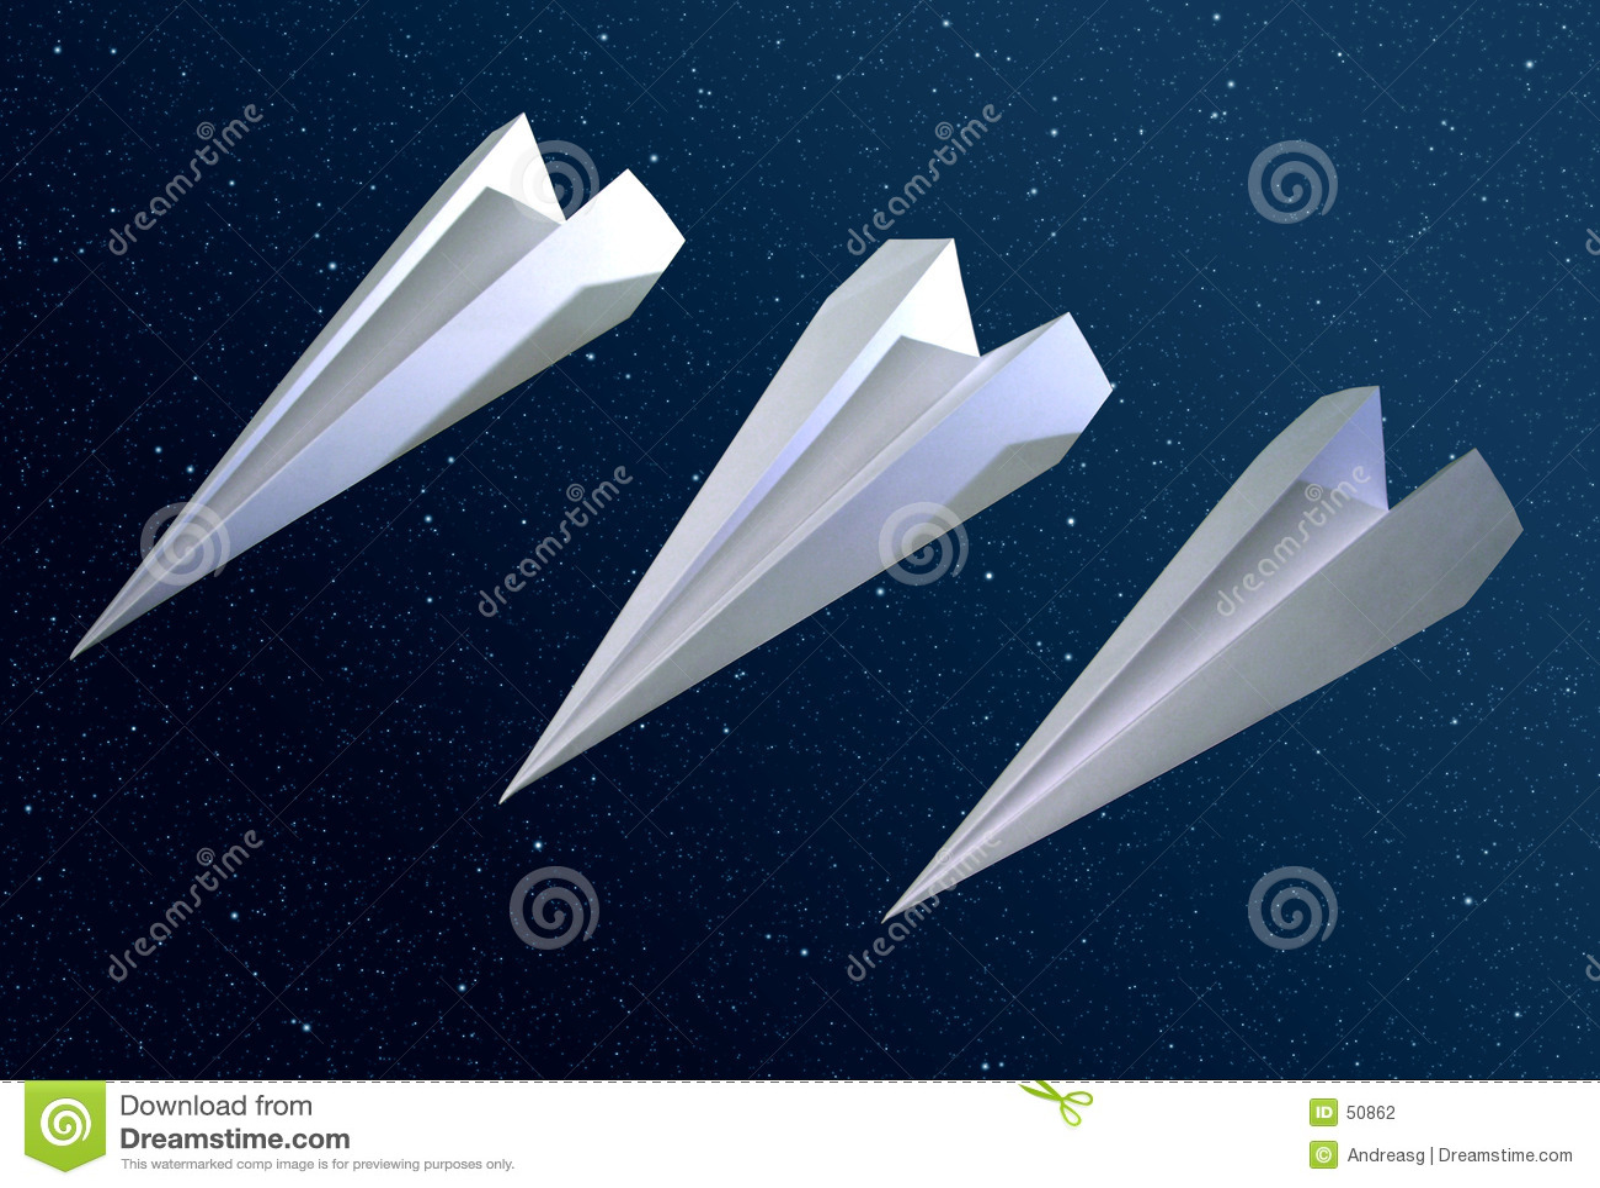 3 origami Raketen im Platz